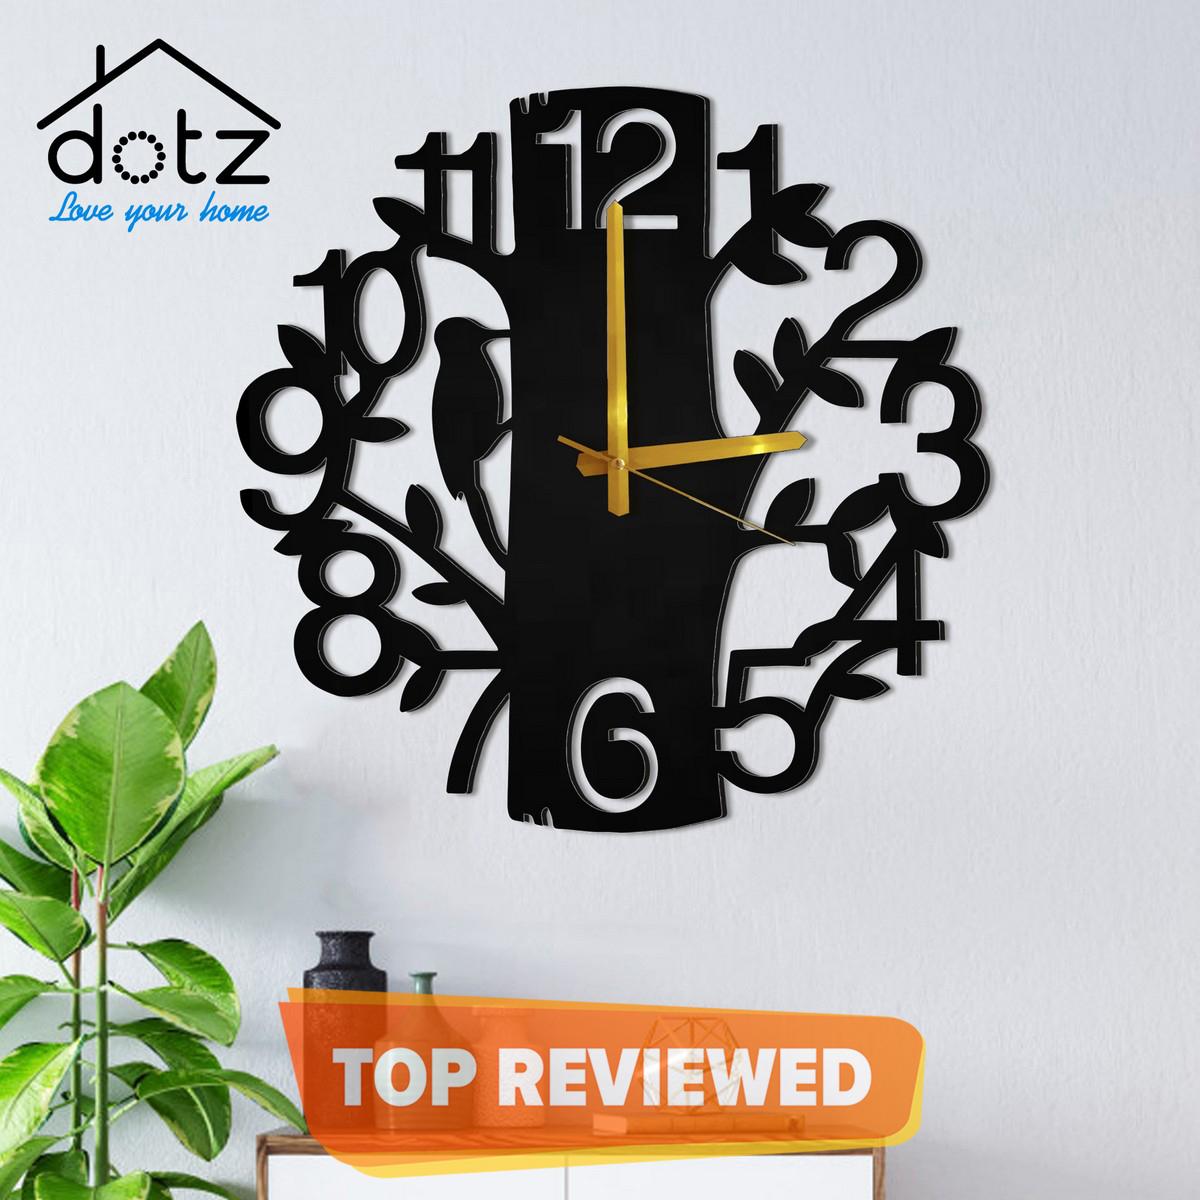 Tree design 12x12  inches clock-large wooden 3D tree clock-stylishclock-dotz brand wall clock-new style tree  clock for home-tree and branches style clock